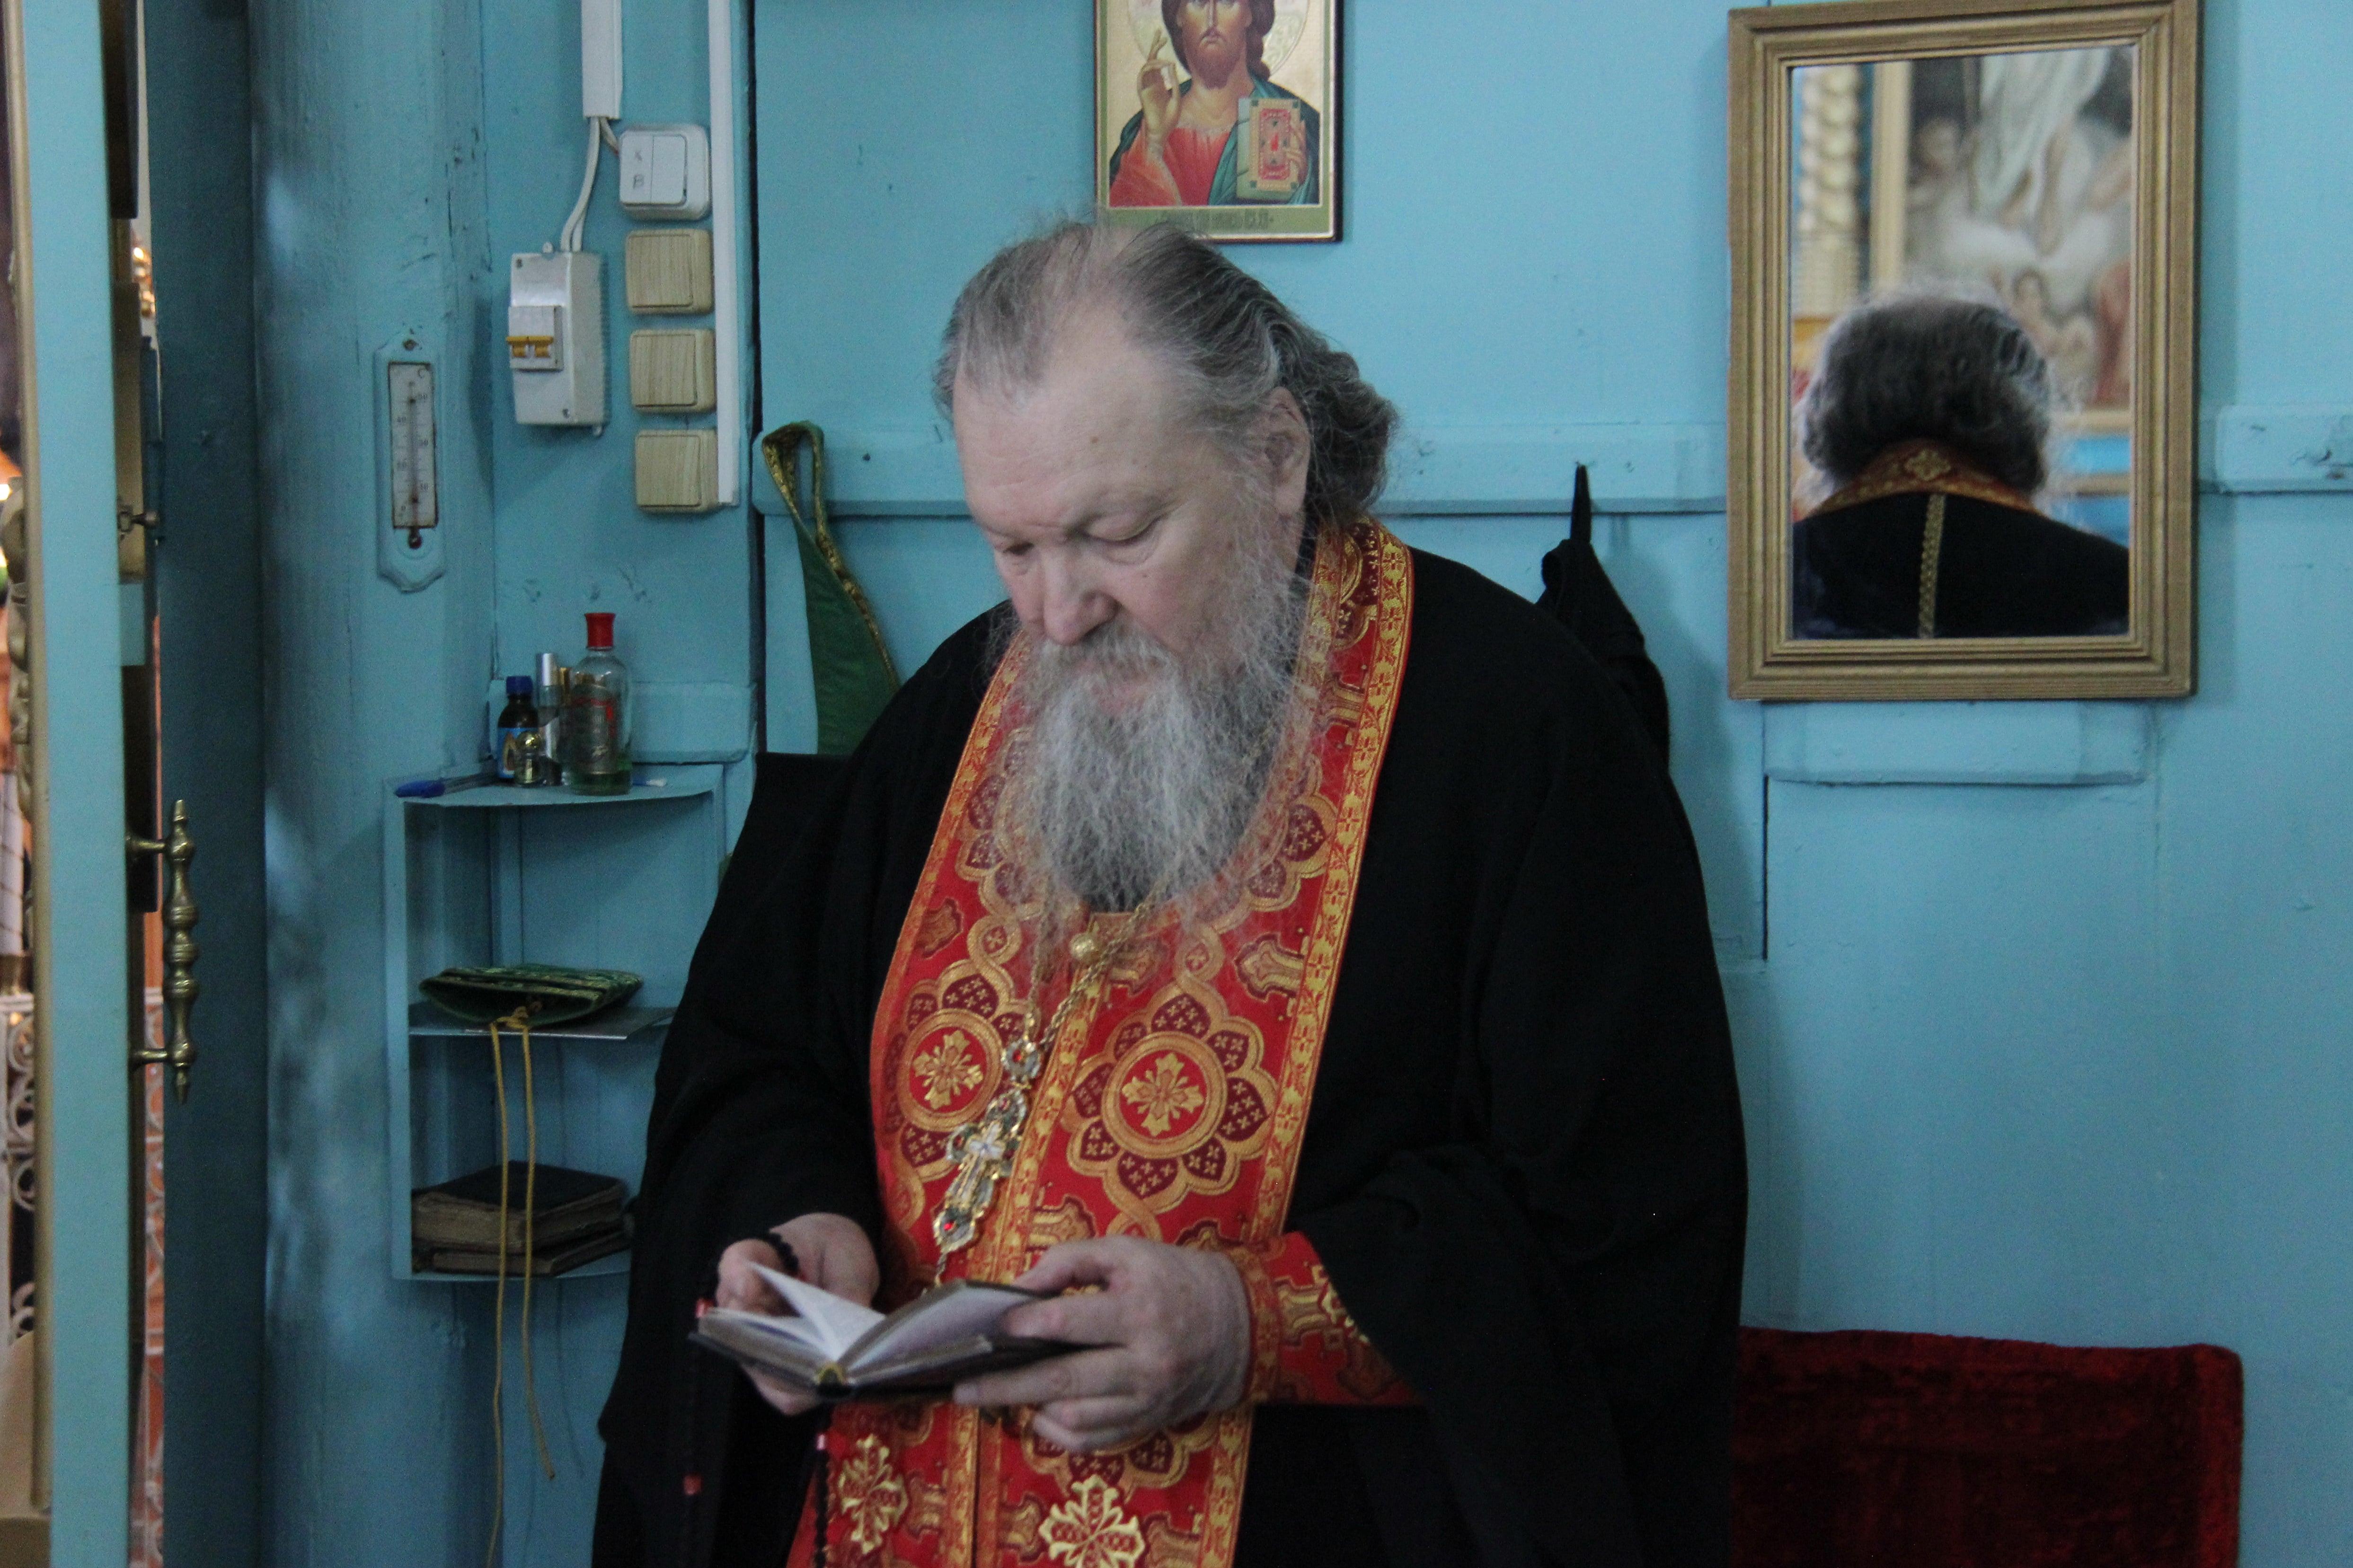 http://monuspen.ru/photoreports/761cedcebac14ed511129cb83b587d47.JPG